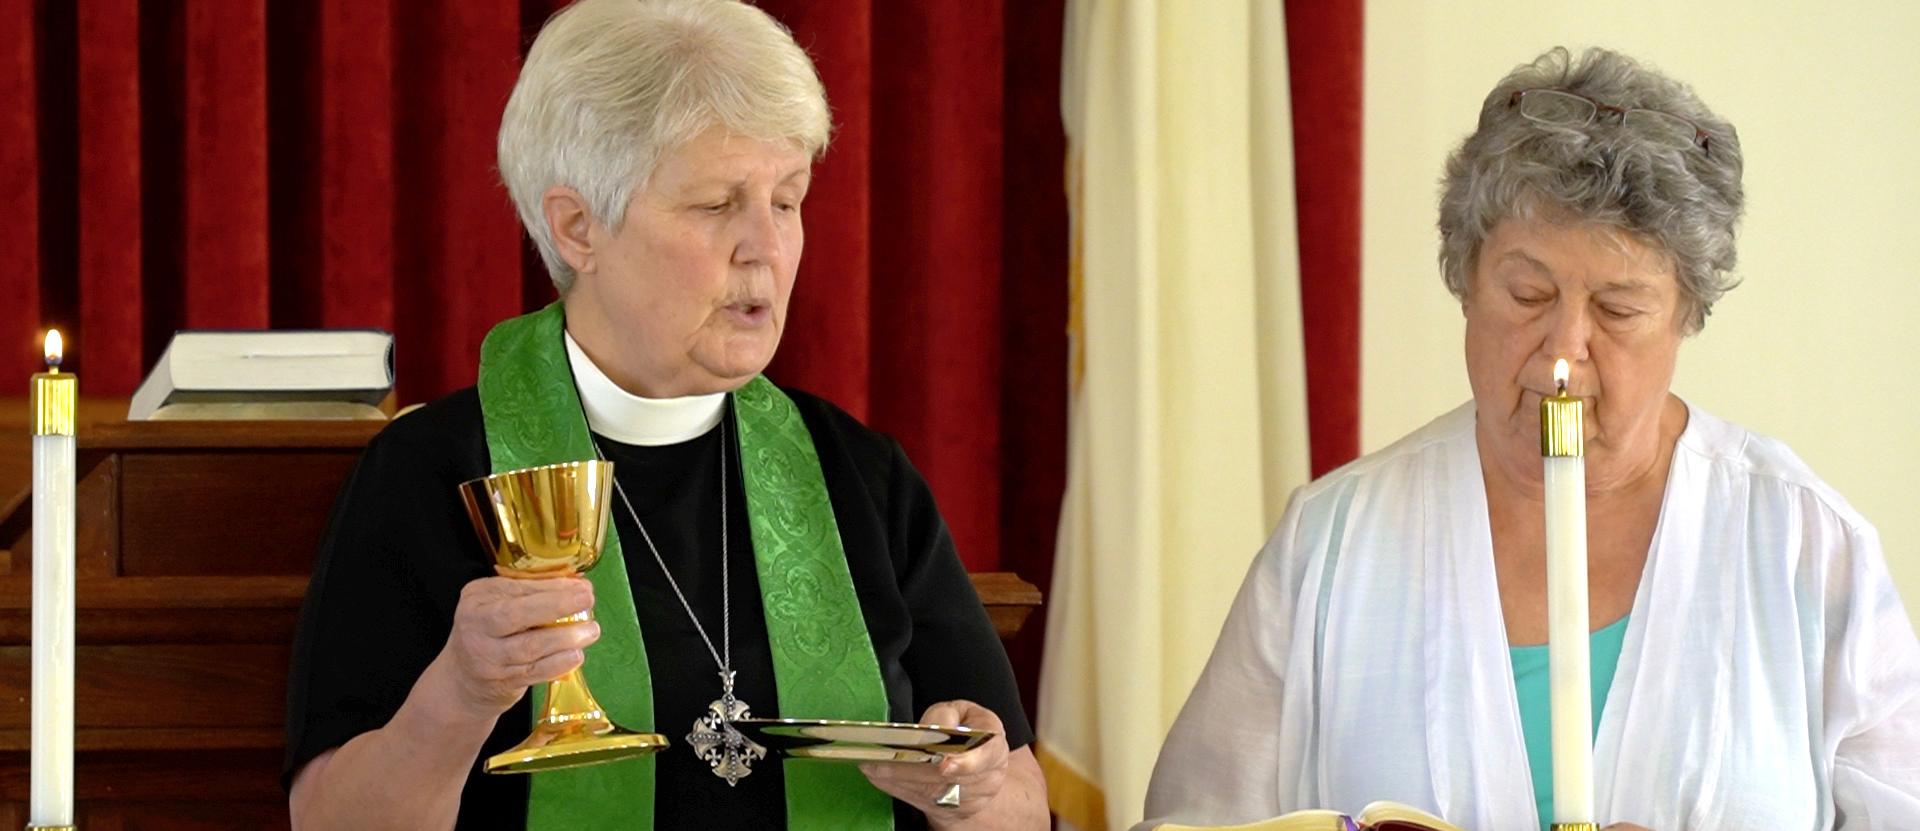 Vicar invites congregation to the eucharist